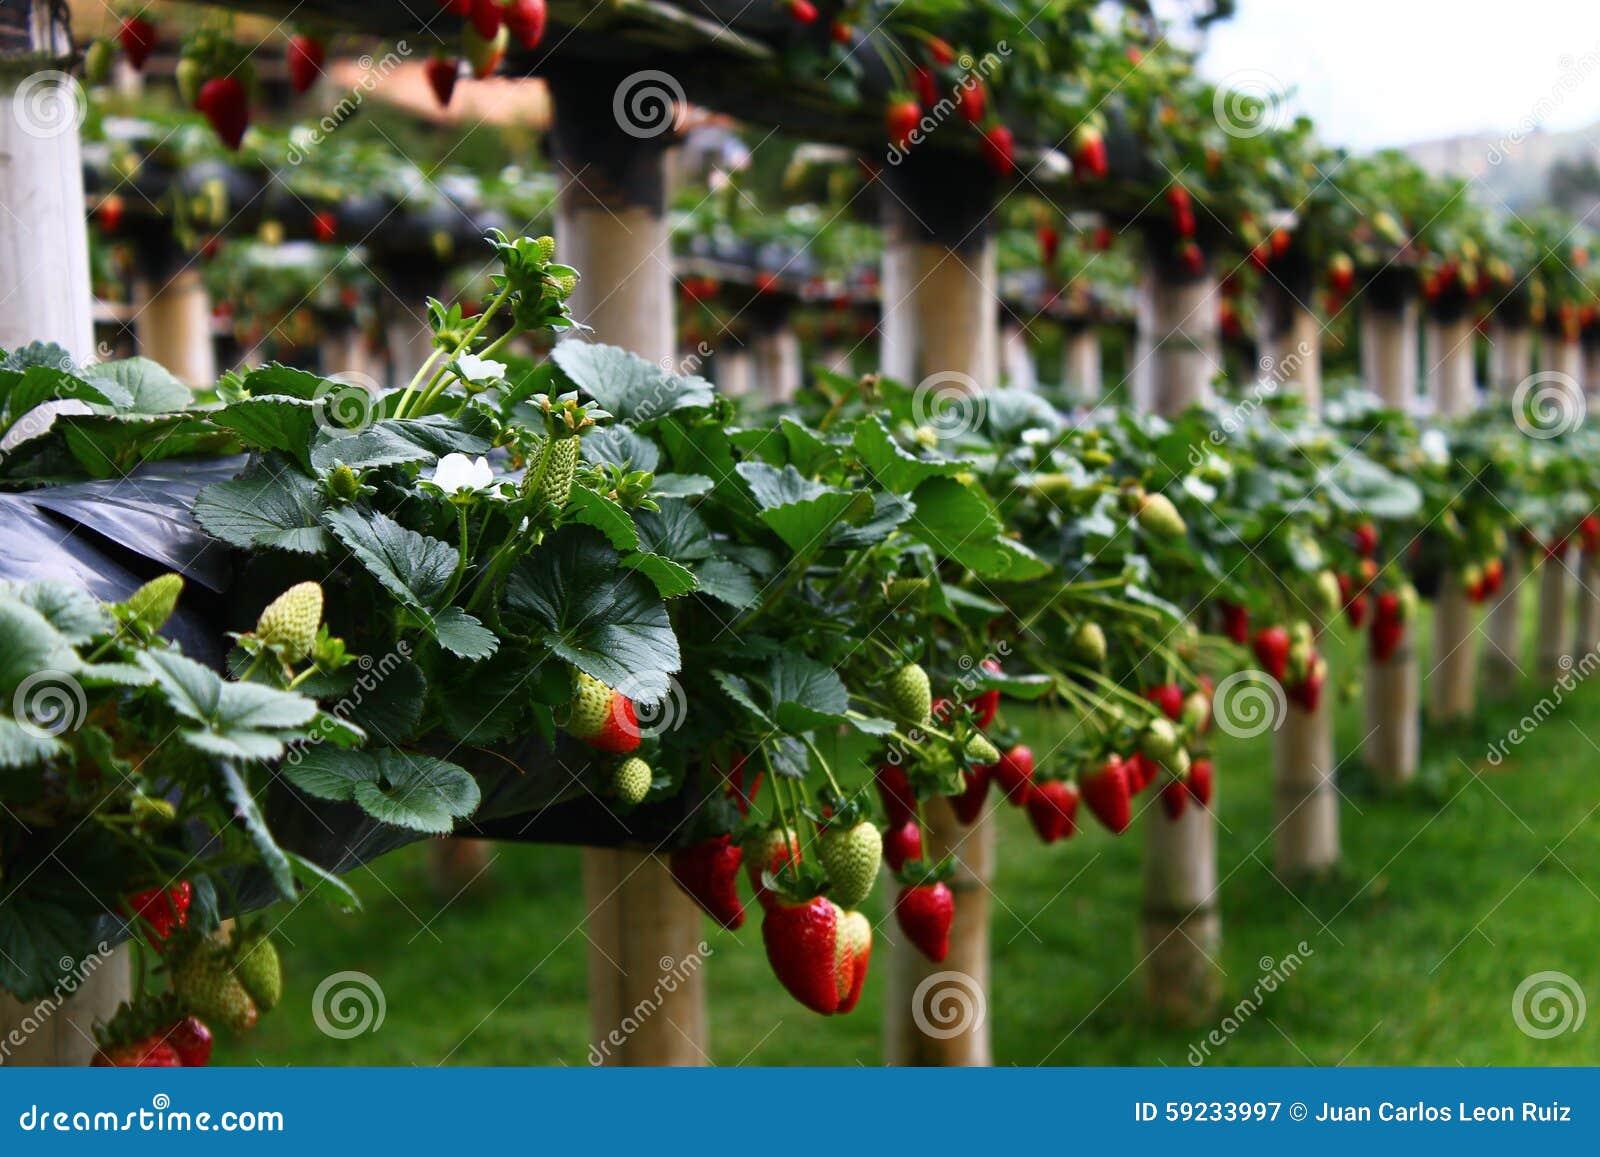 Download Fruta tropical imagen de archivo. Imagen de tropical - 59233997